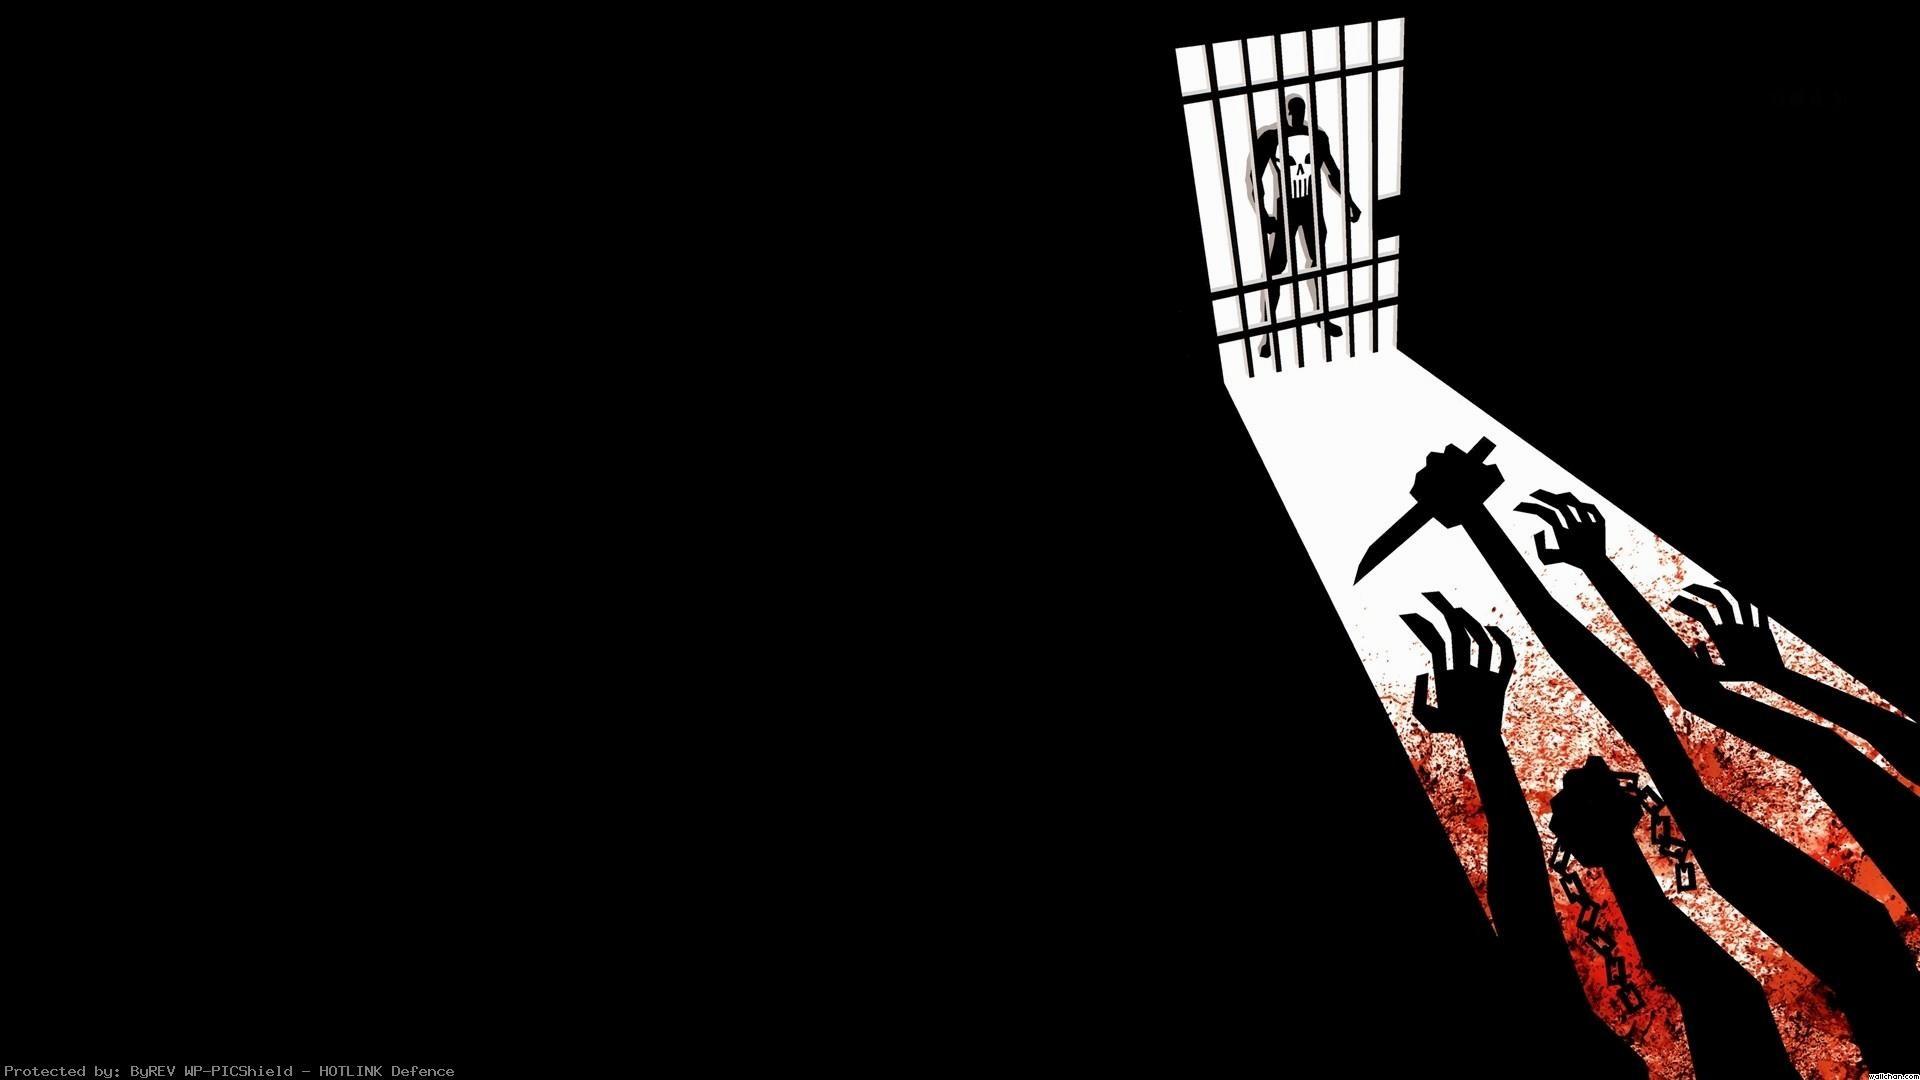 Punisher-HD-wallpaper-wp3809589